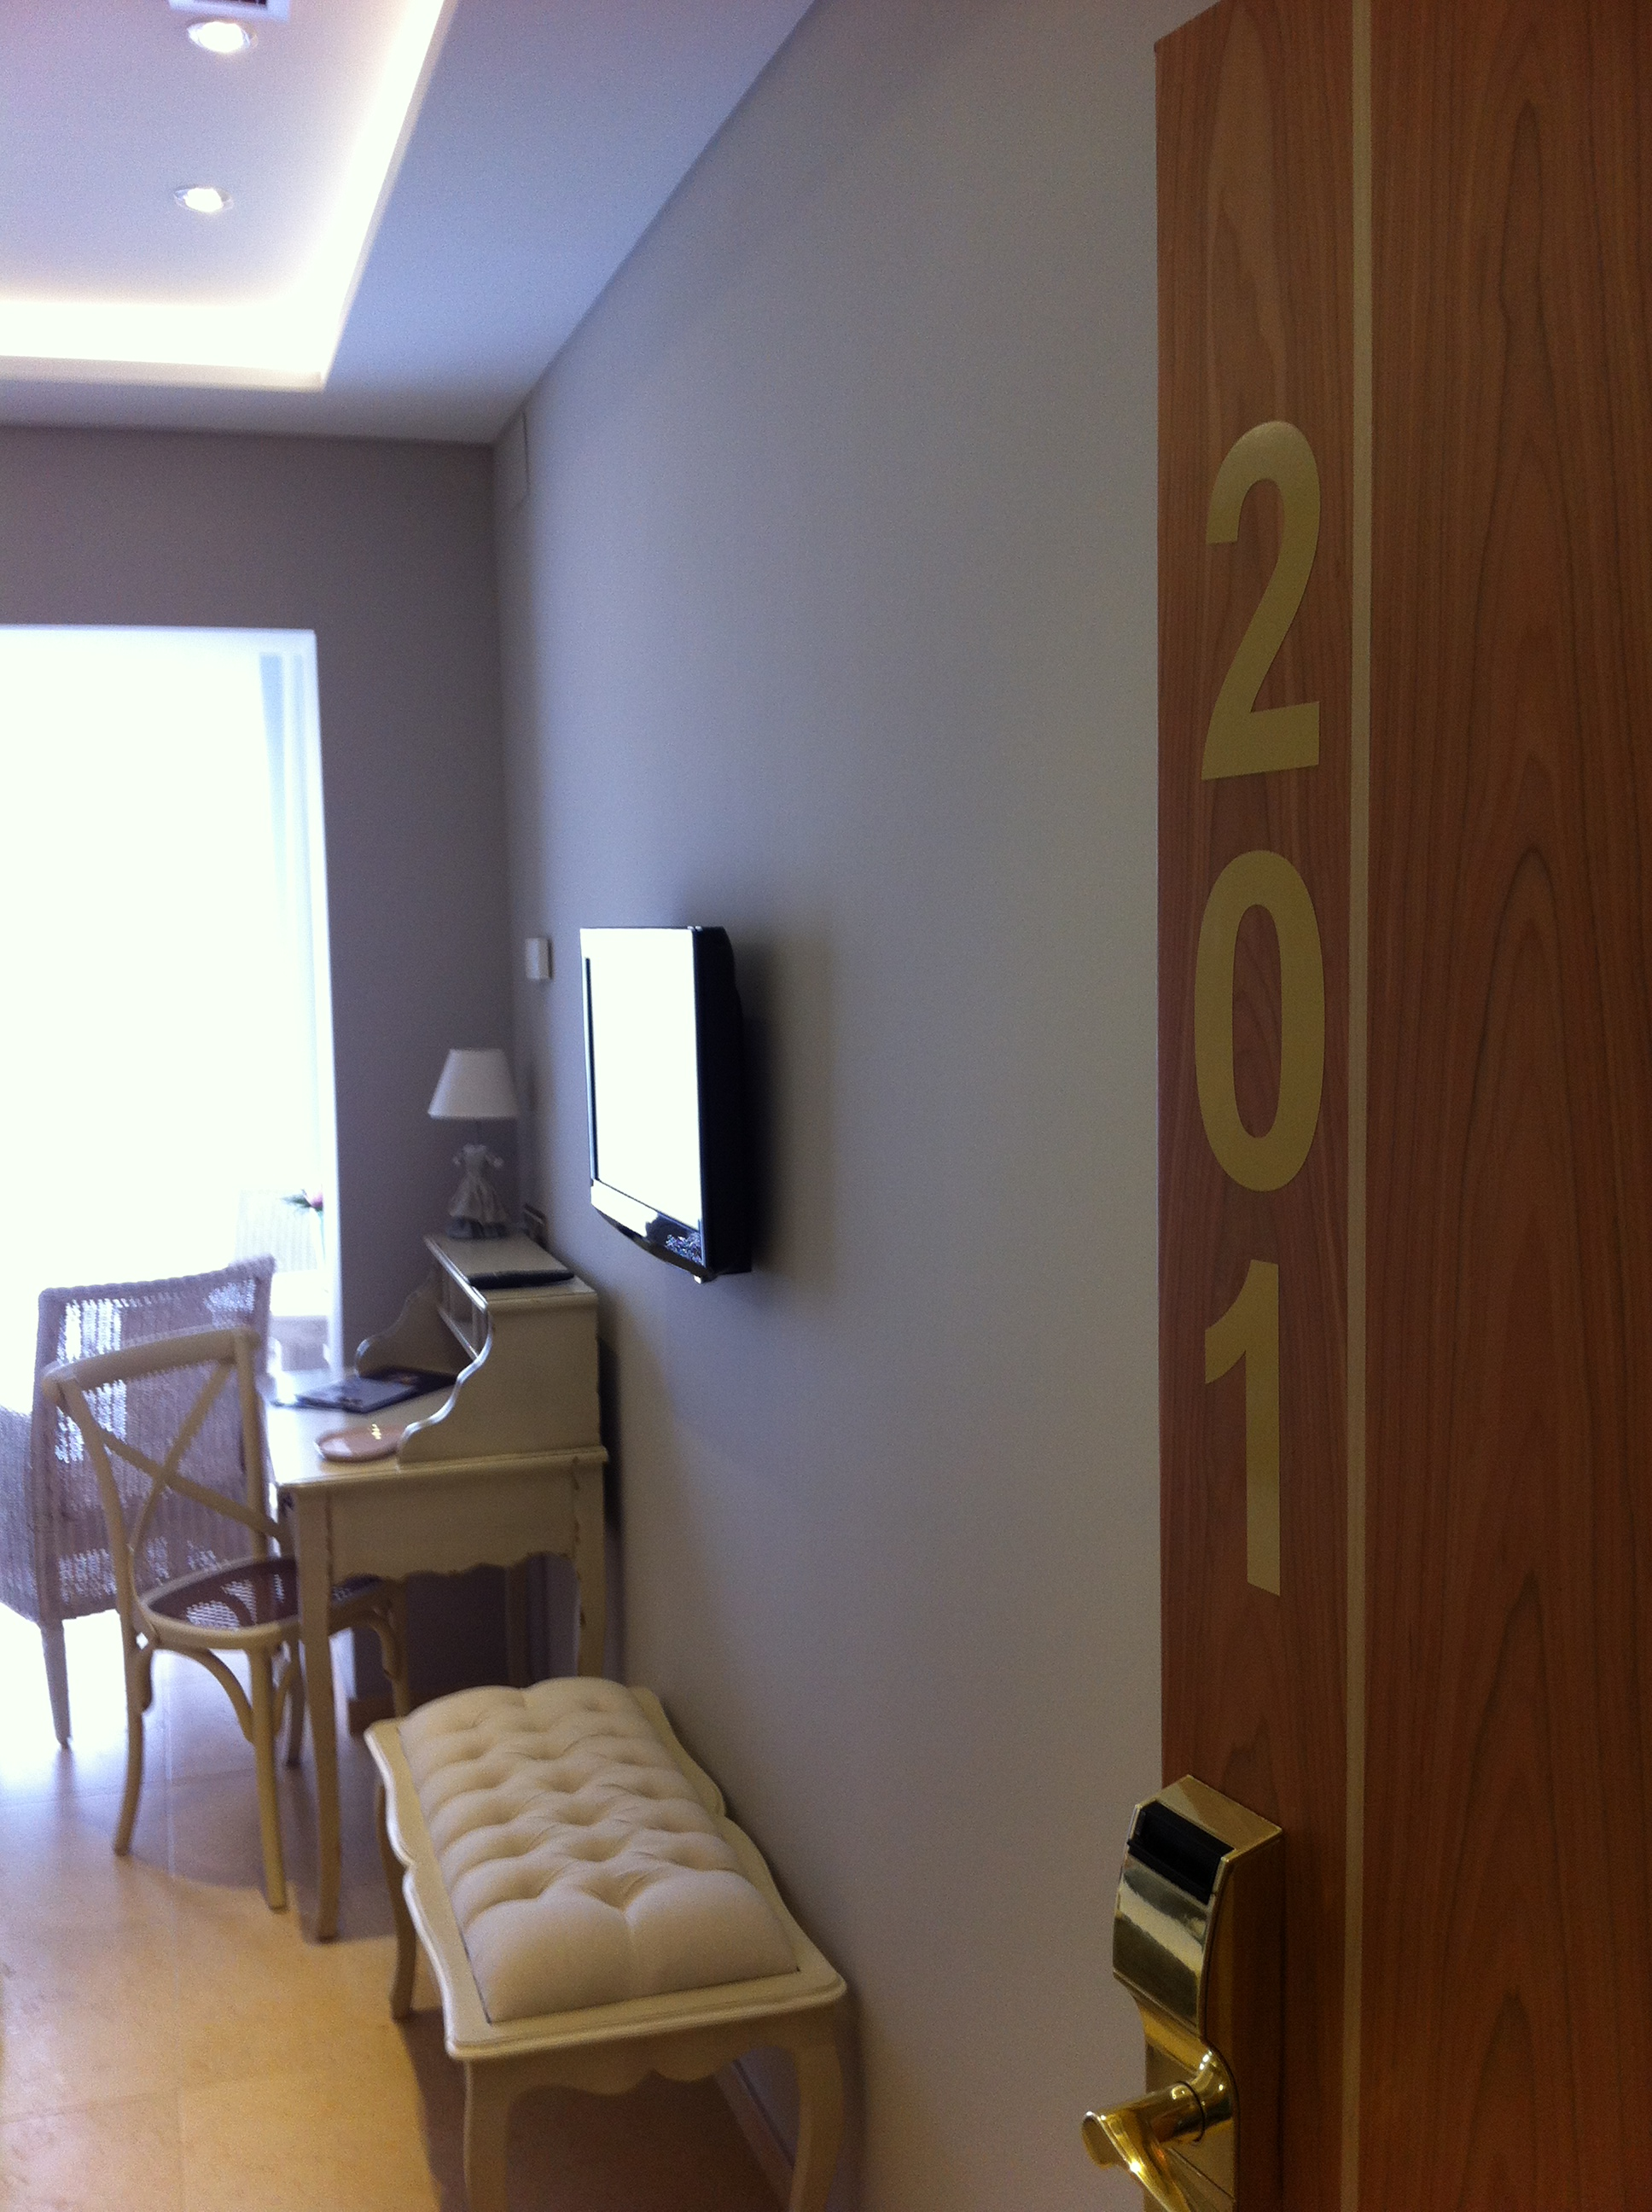 Hotel Ceferino Vilanova Muebles Almazan # Muebles Ceferino